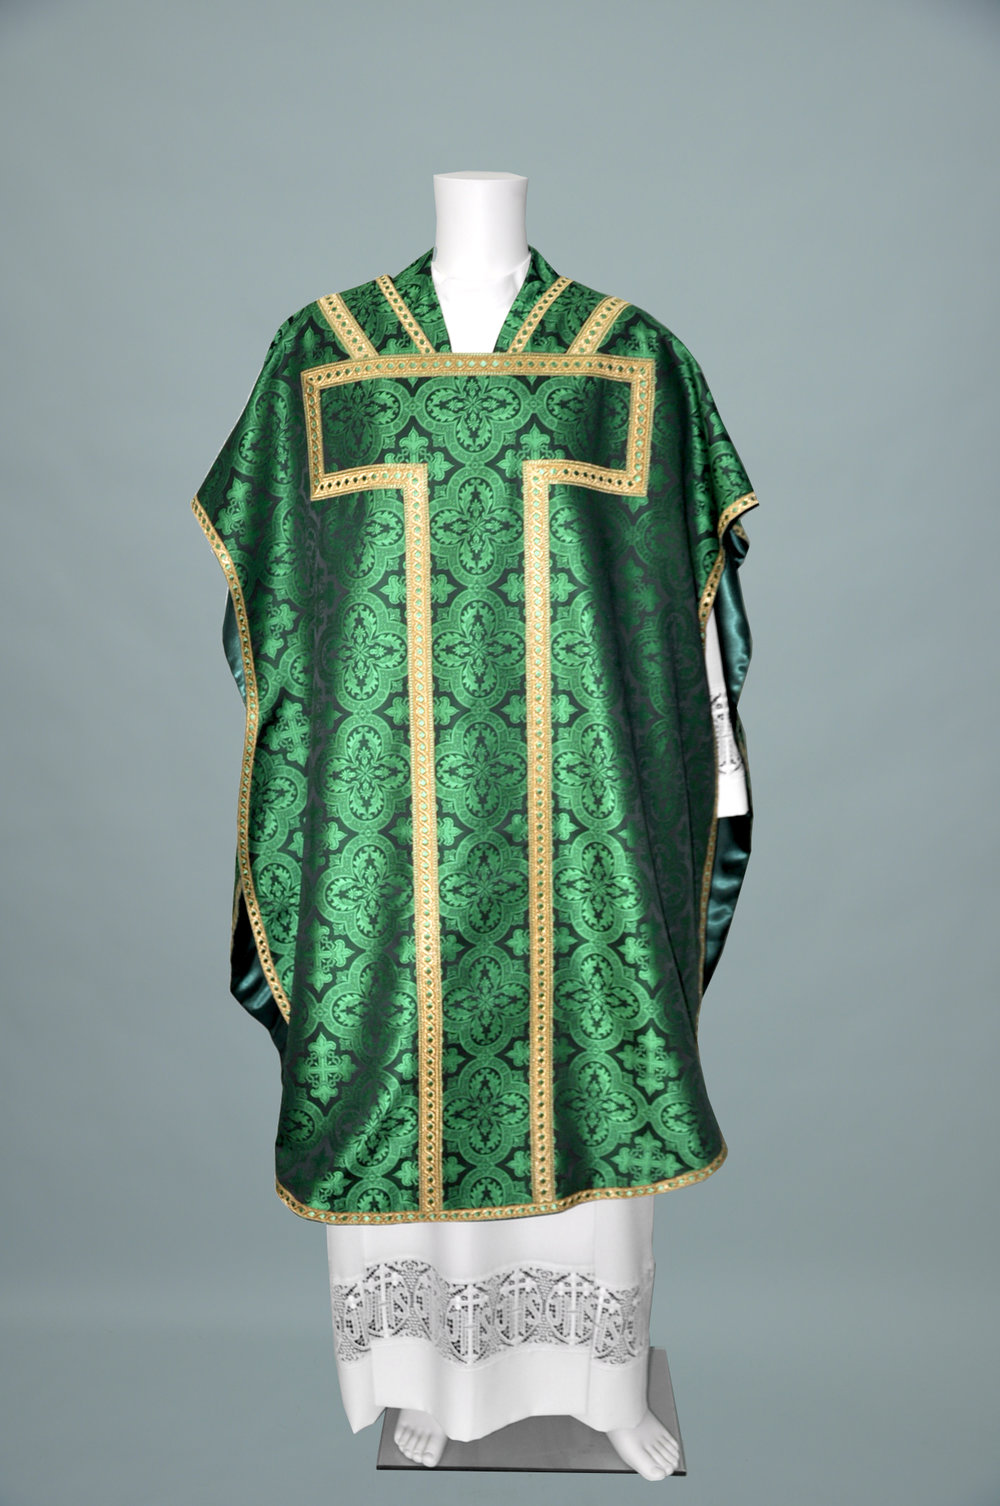 St Philip Neri Davinci Green W 2326 Green gold (f)1.jpg